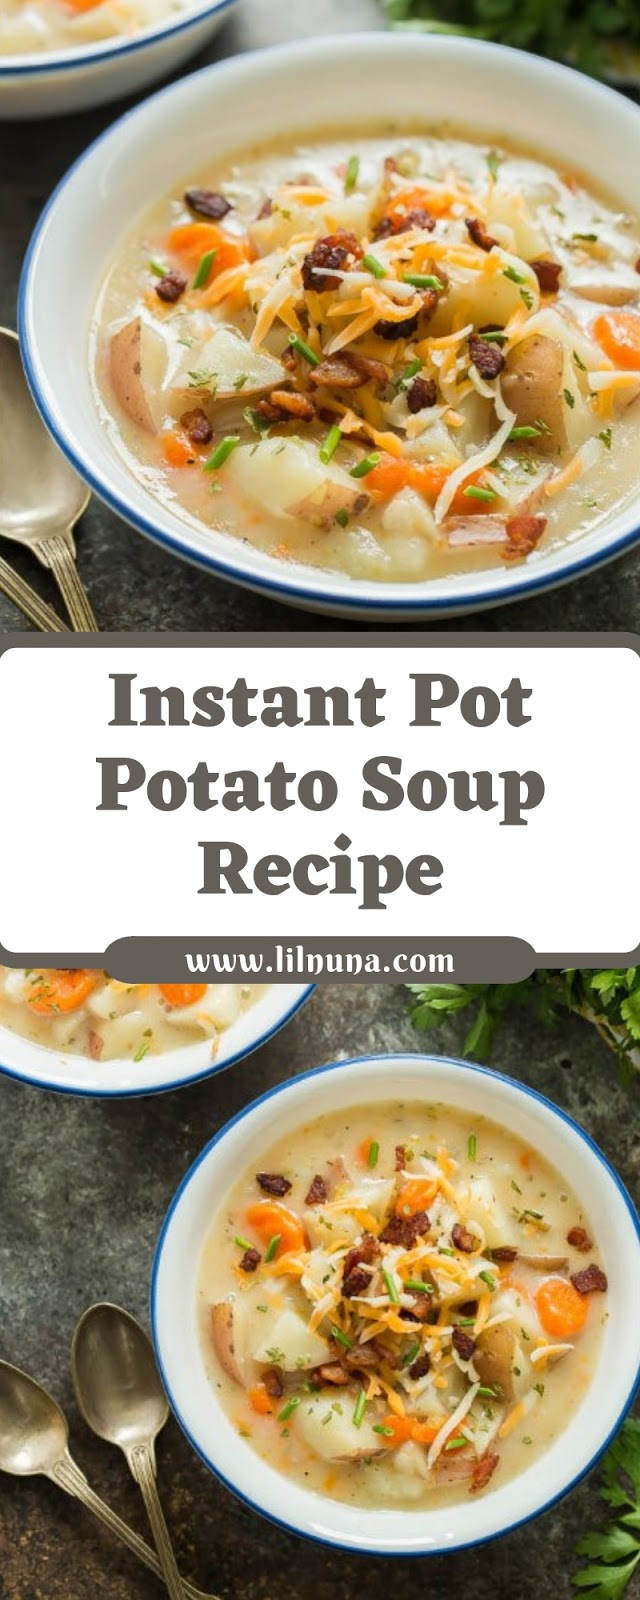 Instant Pot Potato Soup Recipe